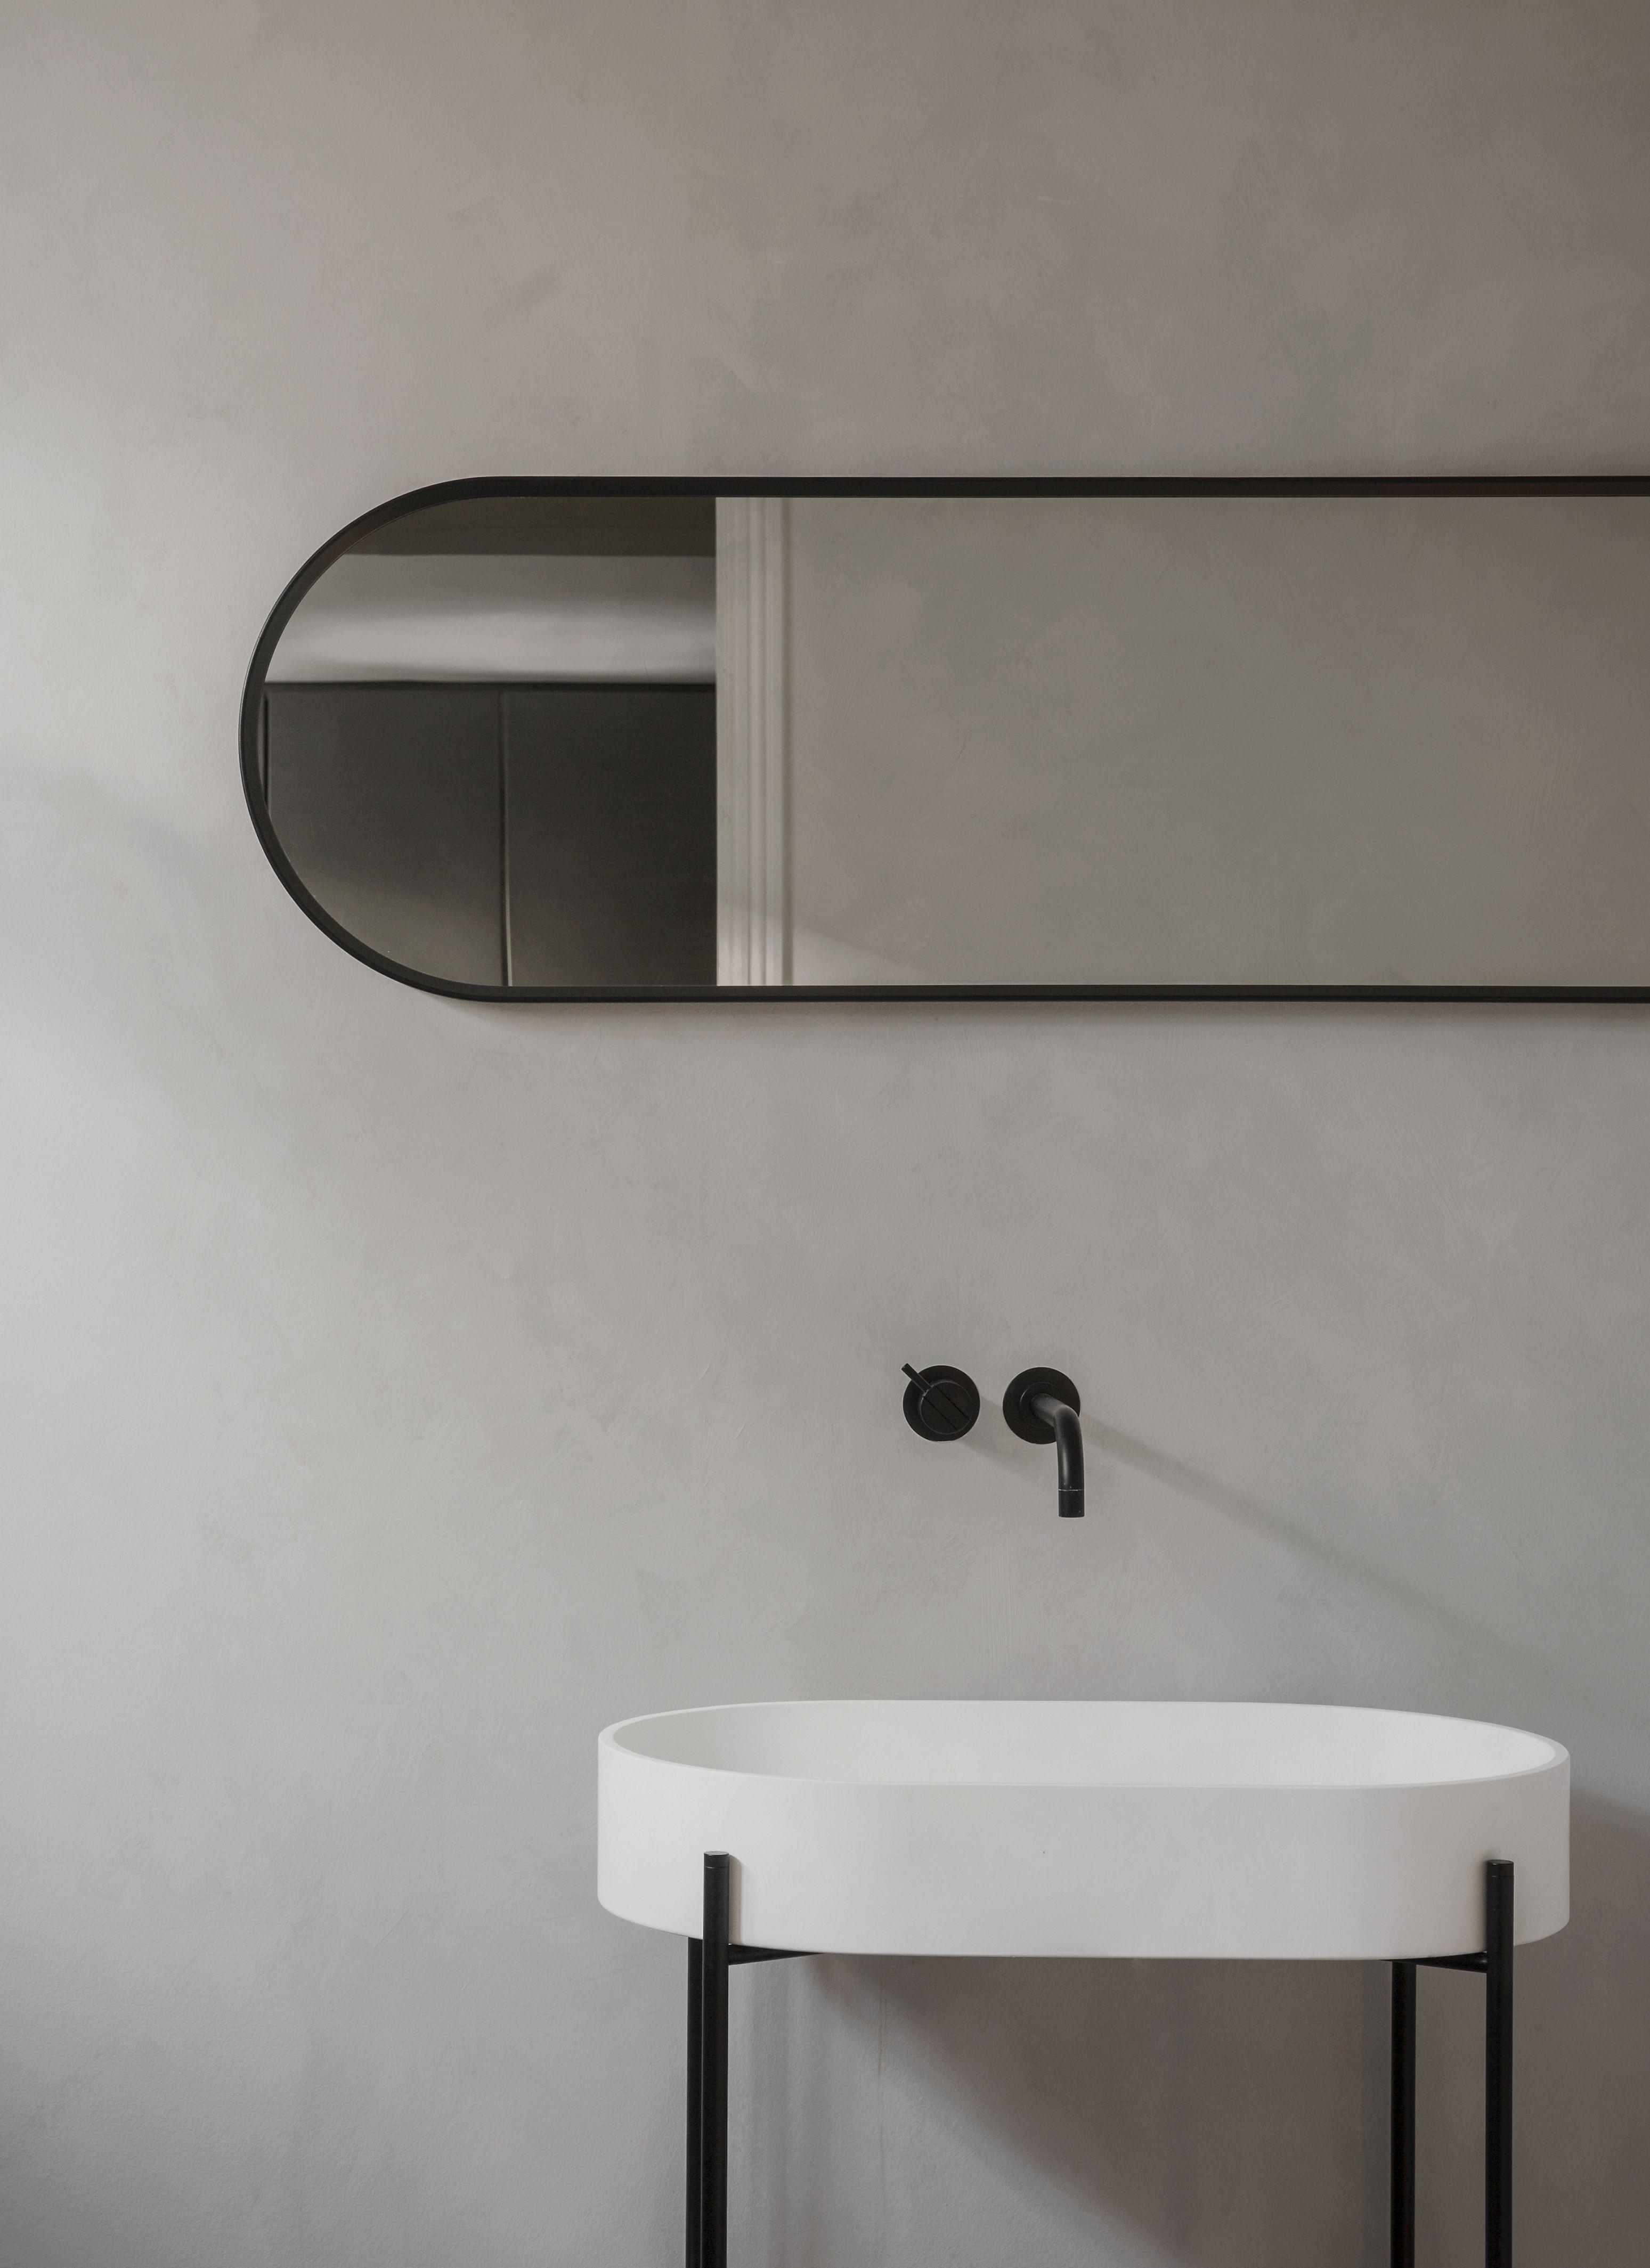 Norm Oval Mirror Menu Ss18 Badezimmer Innenausstattung